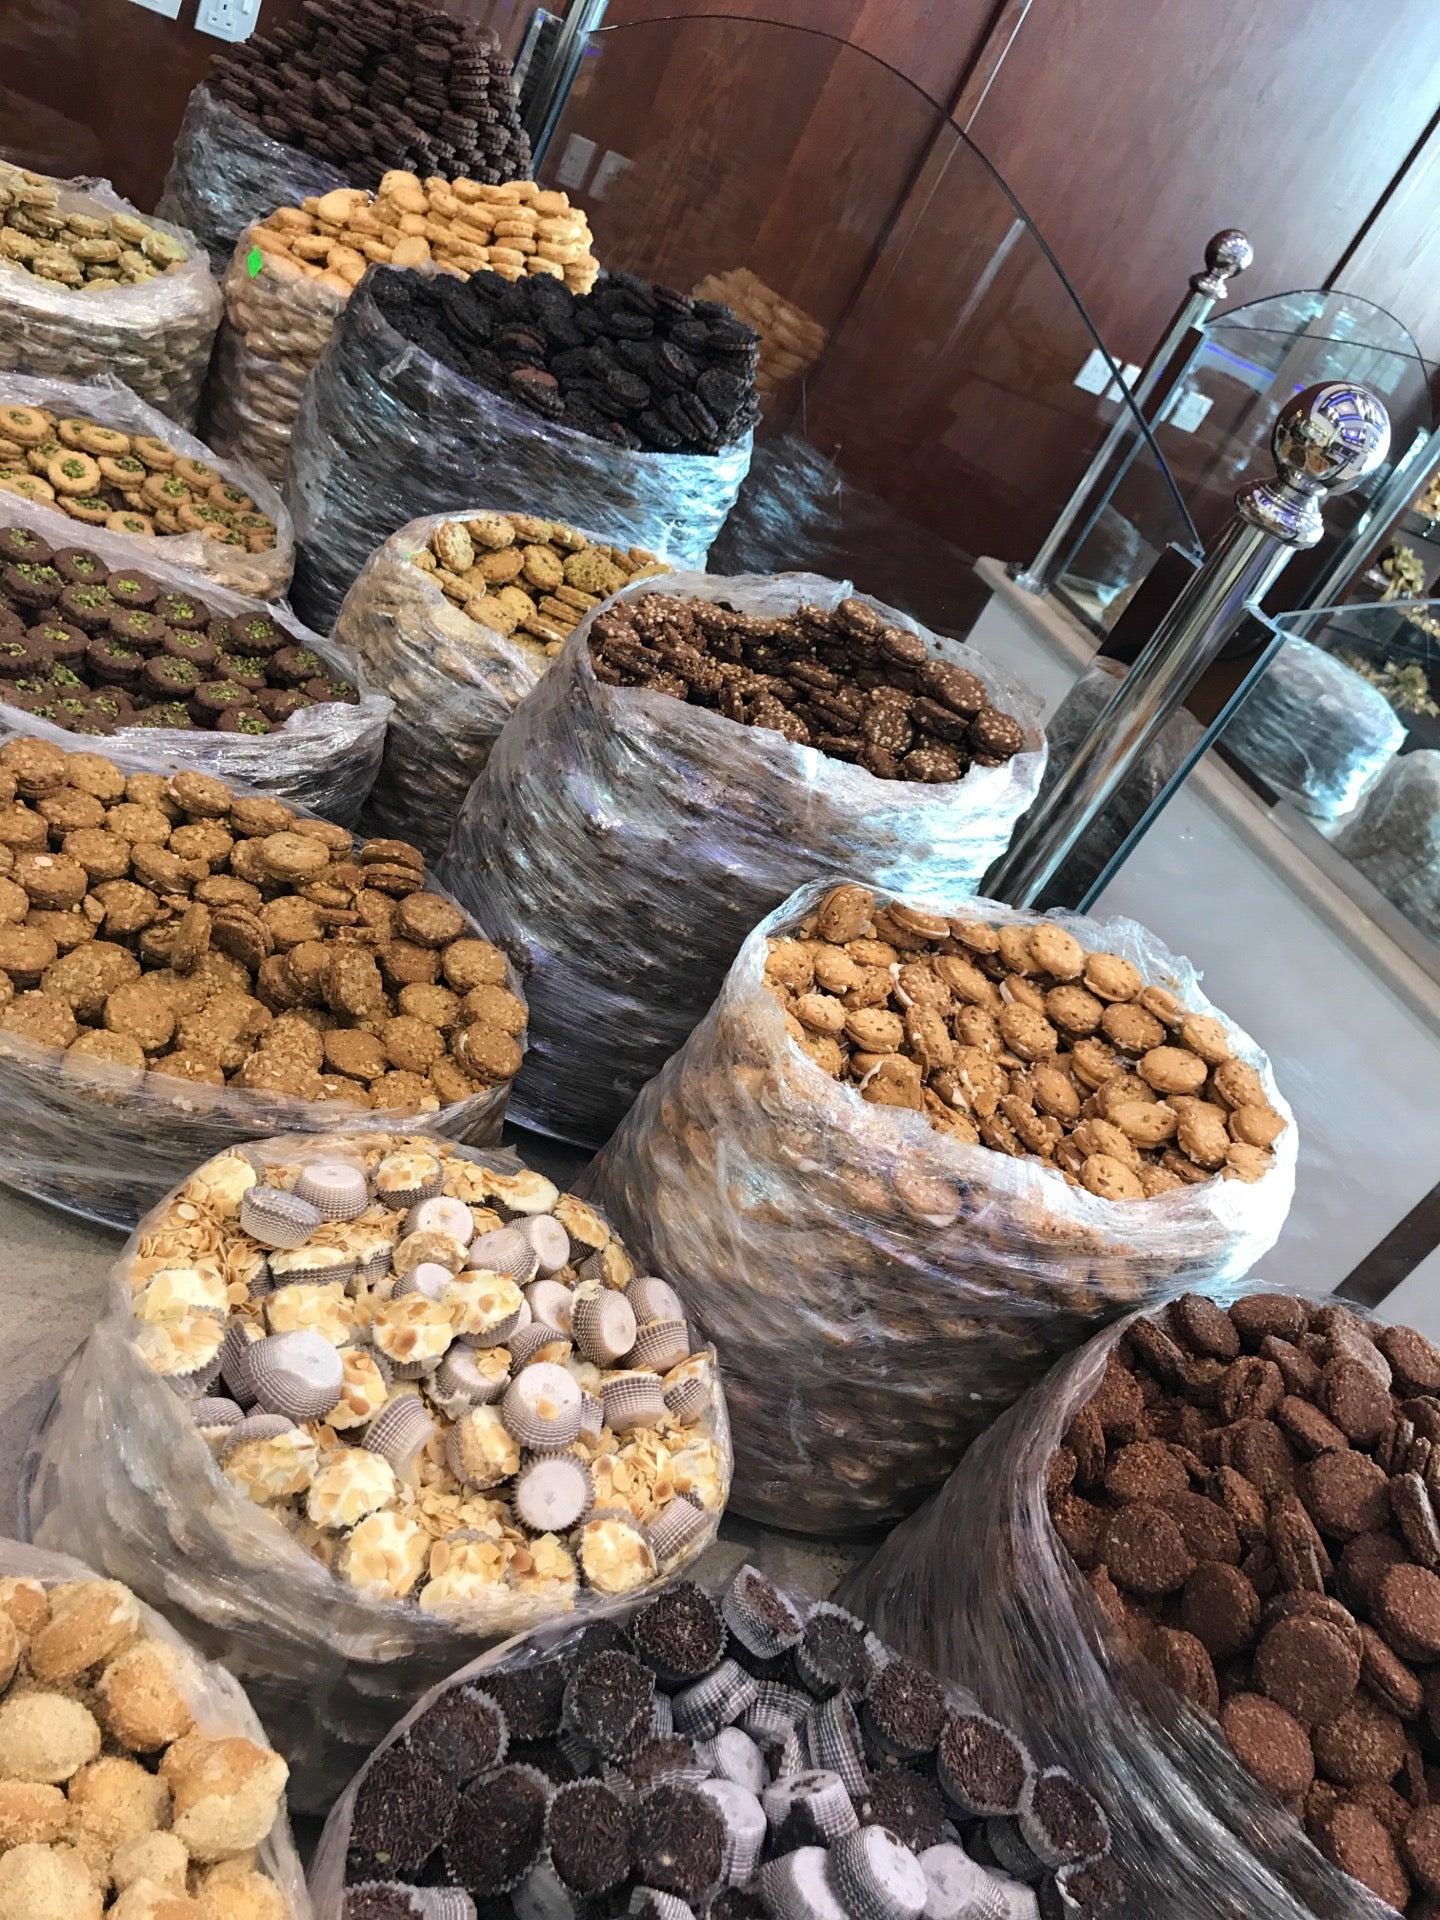 al-riyadh directory - Taiba Bardisi Pastries